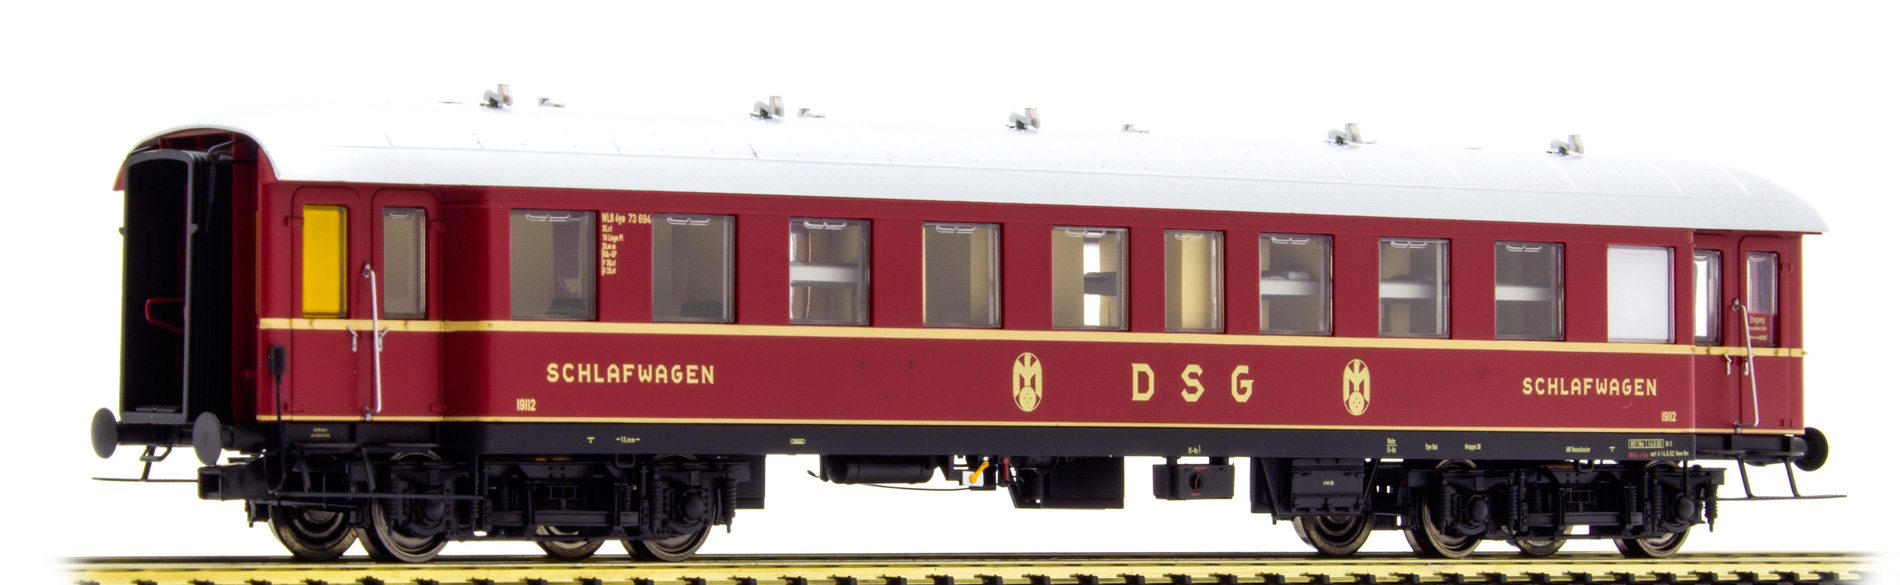 ESU 36151 Foto: Weblink Modellbahnshop Lippe